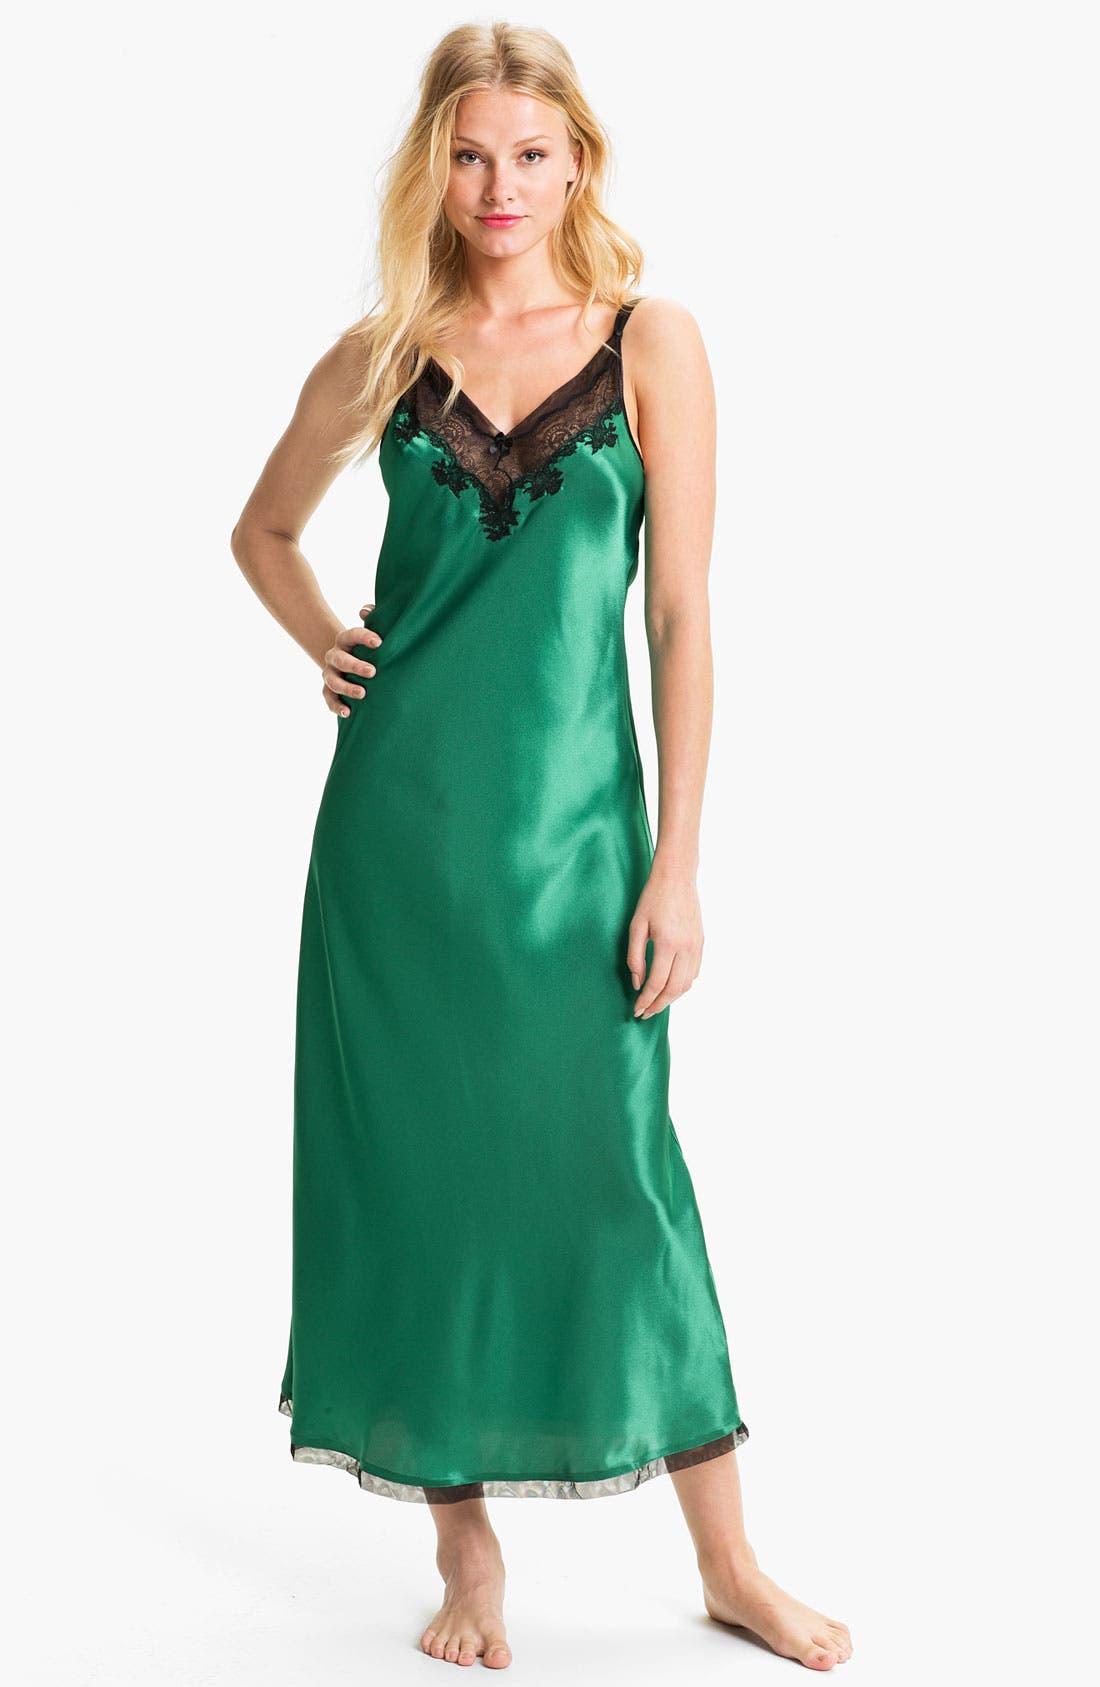 Main Image - Oscar de la Renta Sleepwear Lace Trim Charmeuse Nightgown